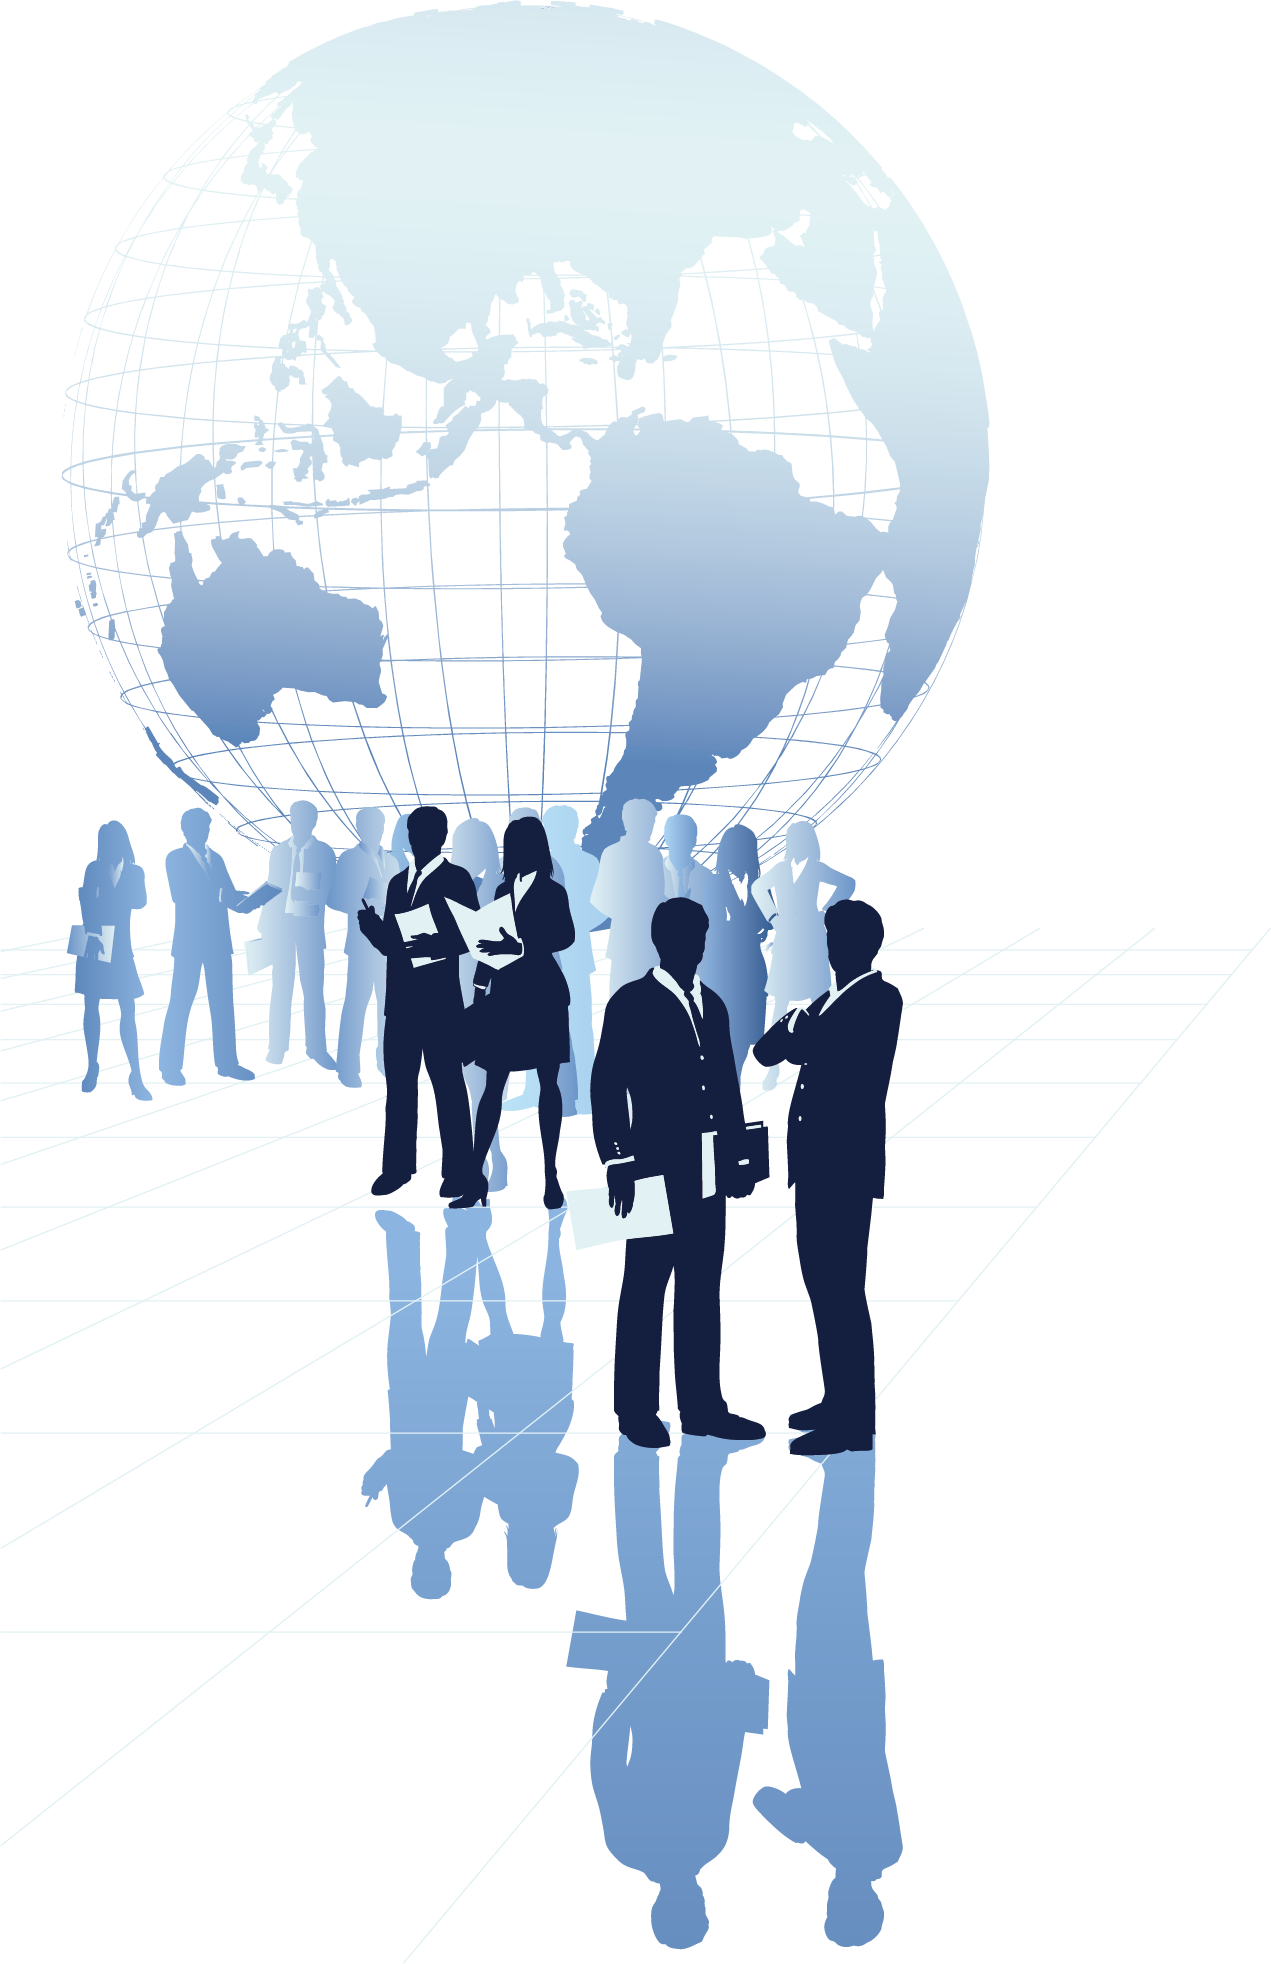 kisspng-businessperson-company-service-empresa-creative-business-people-5a7f55604f2af4.4621884715182943683243